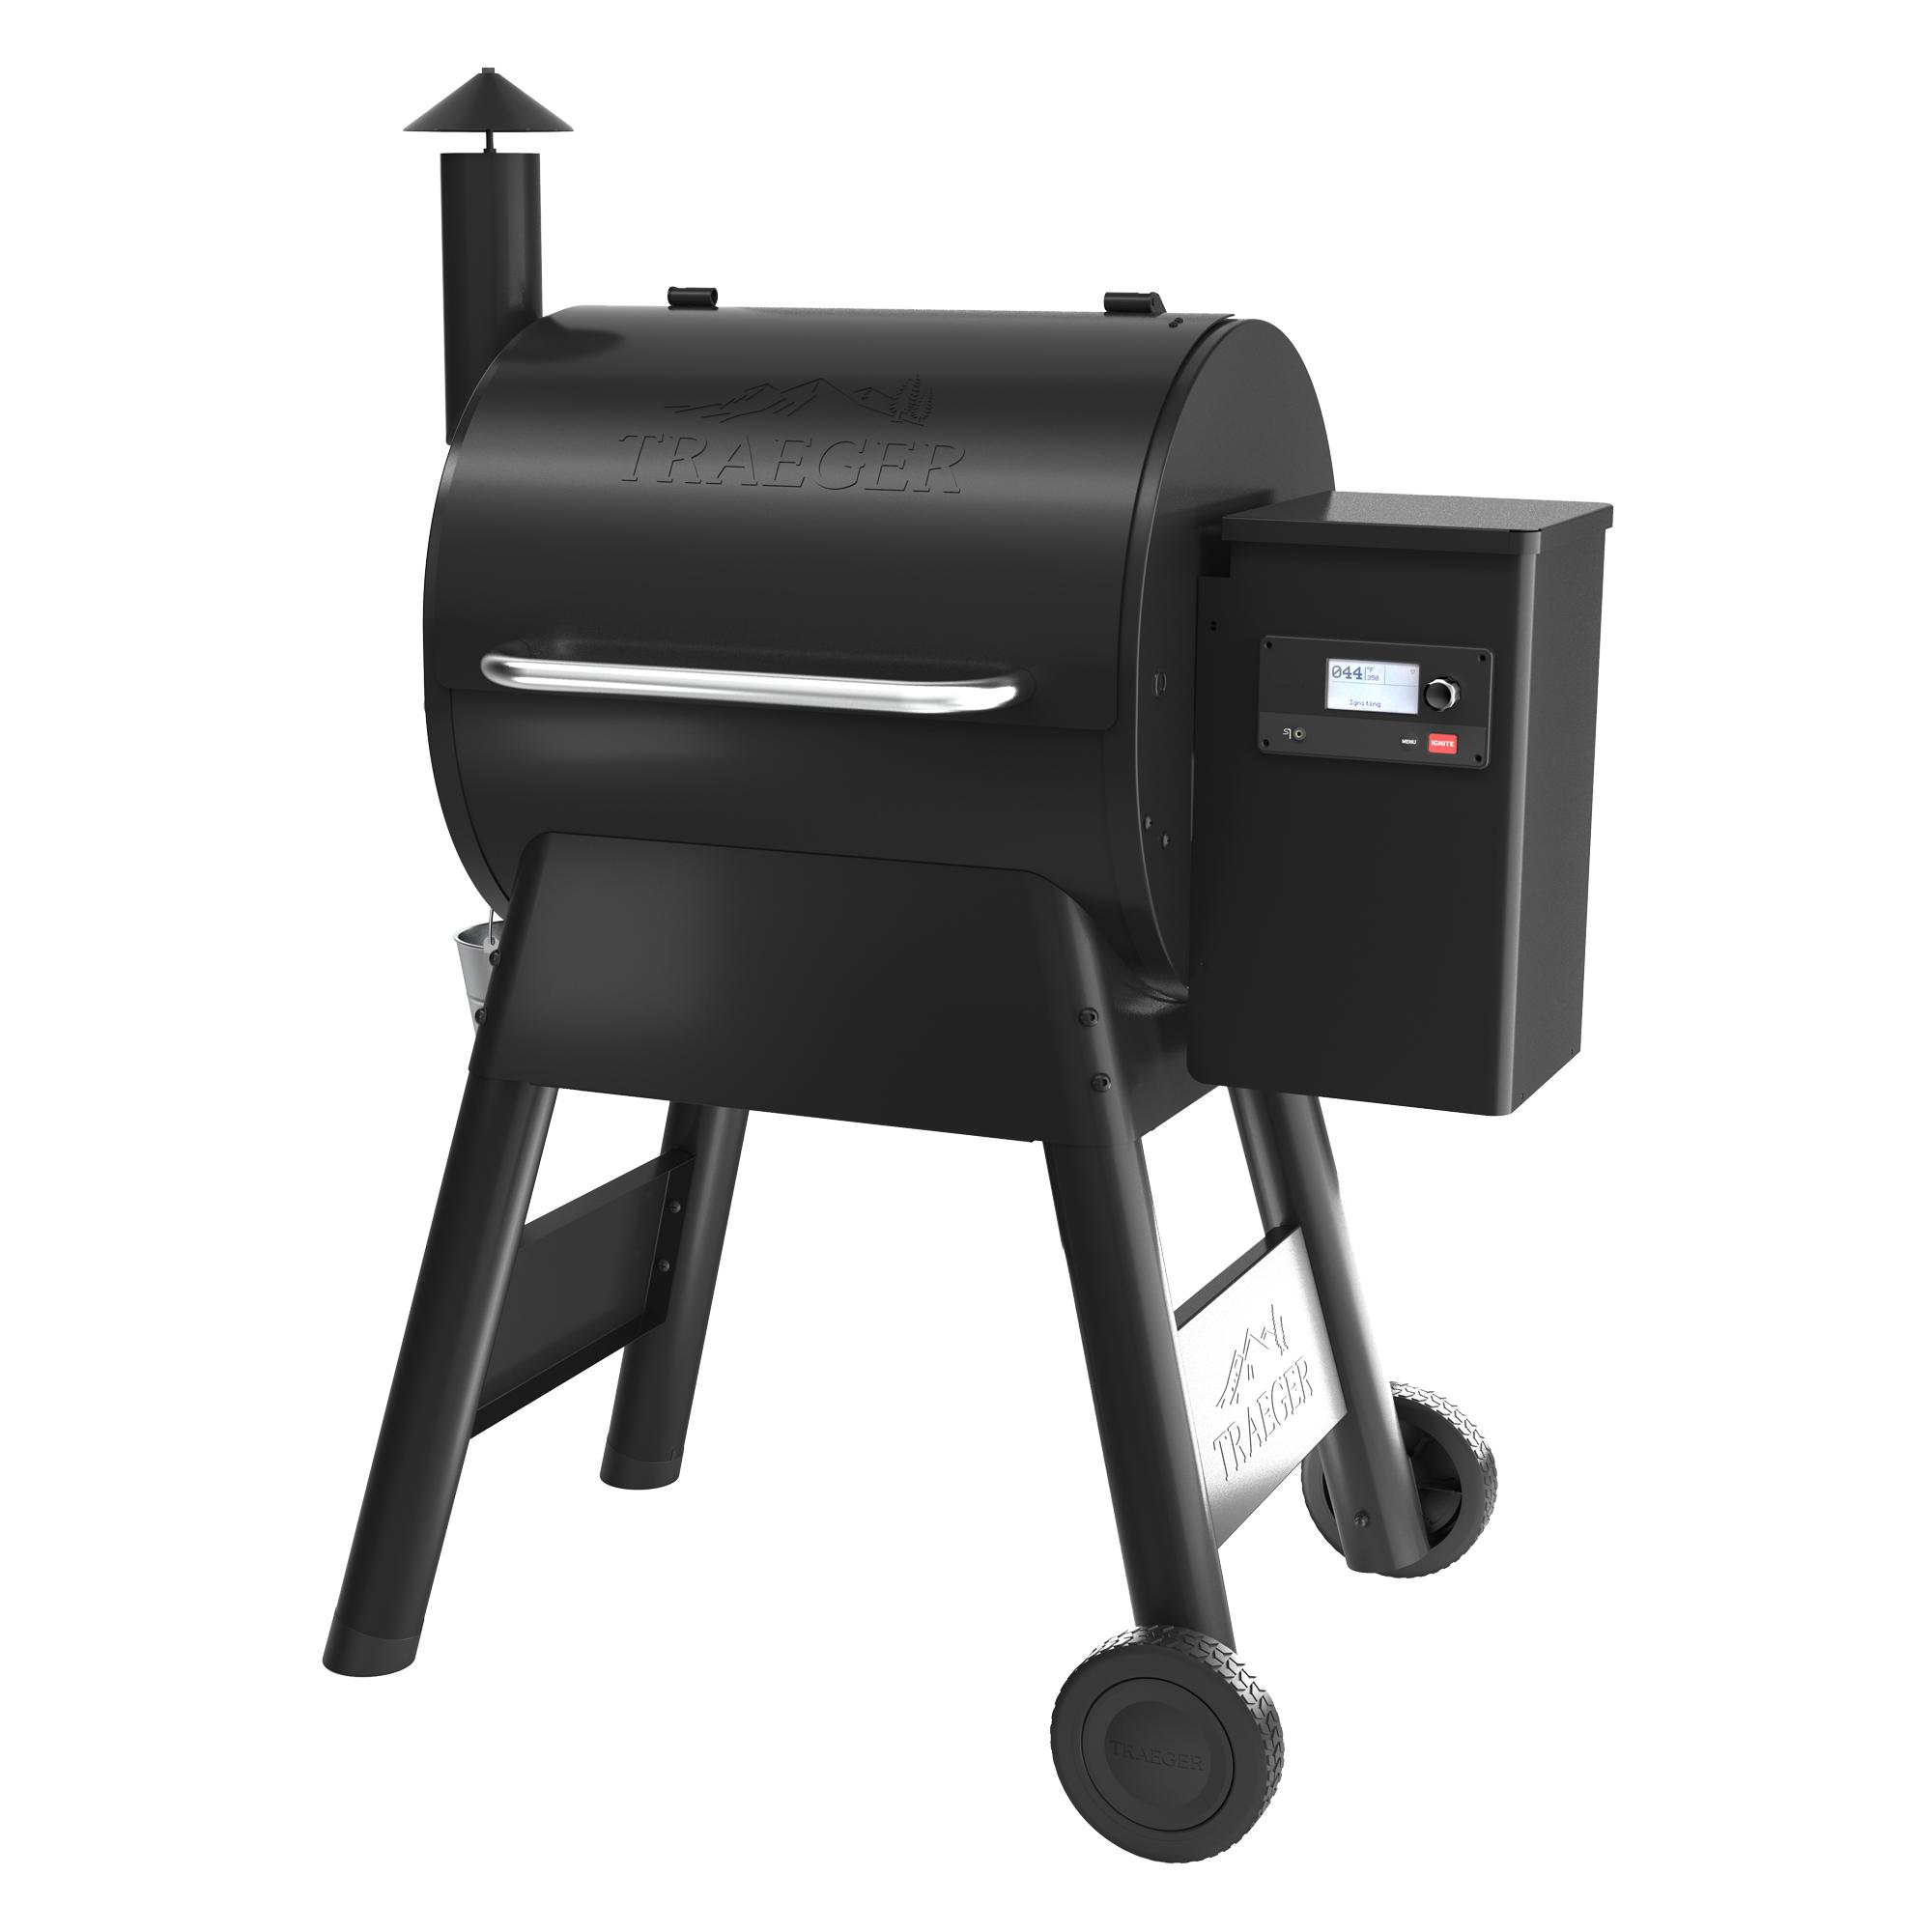 Traeger Pelletgrill Pro D2 575 - Black